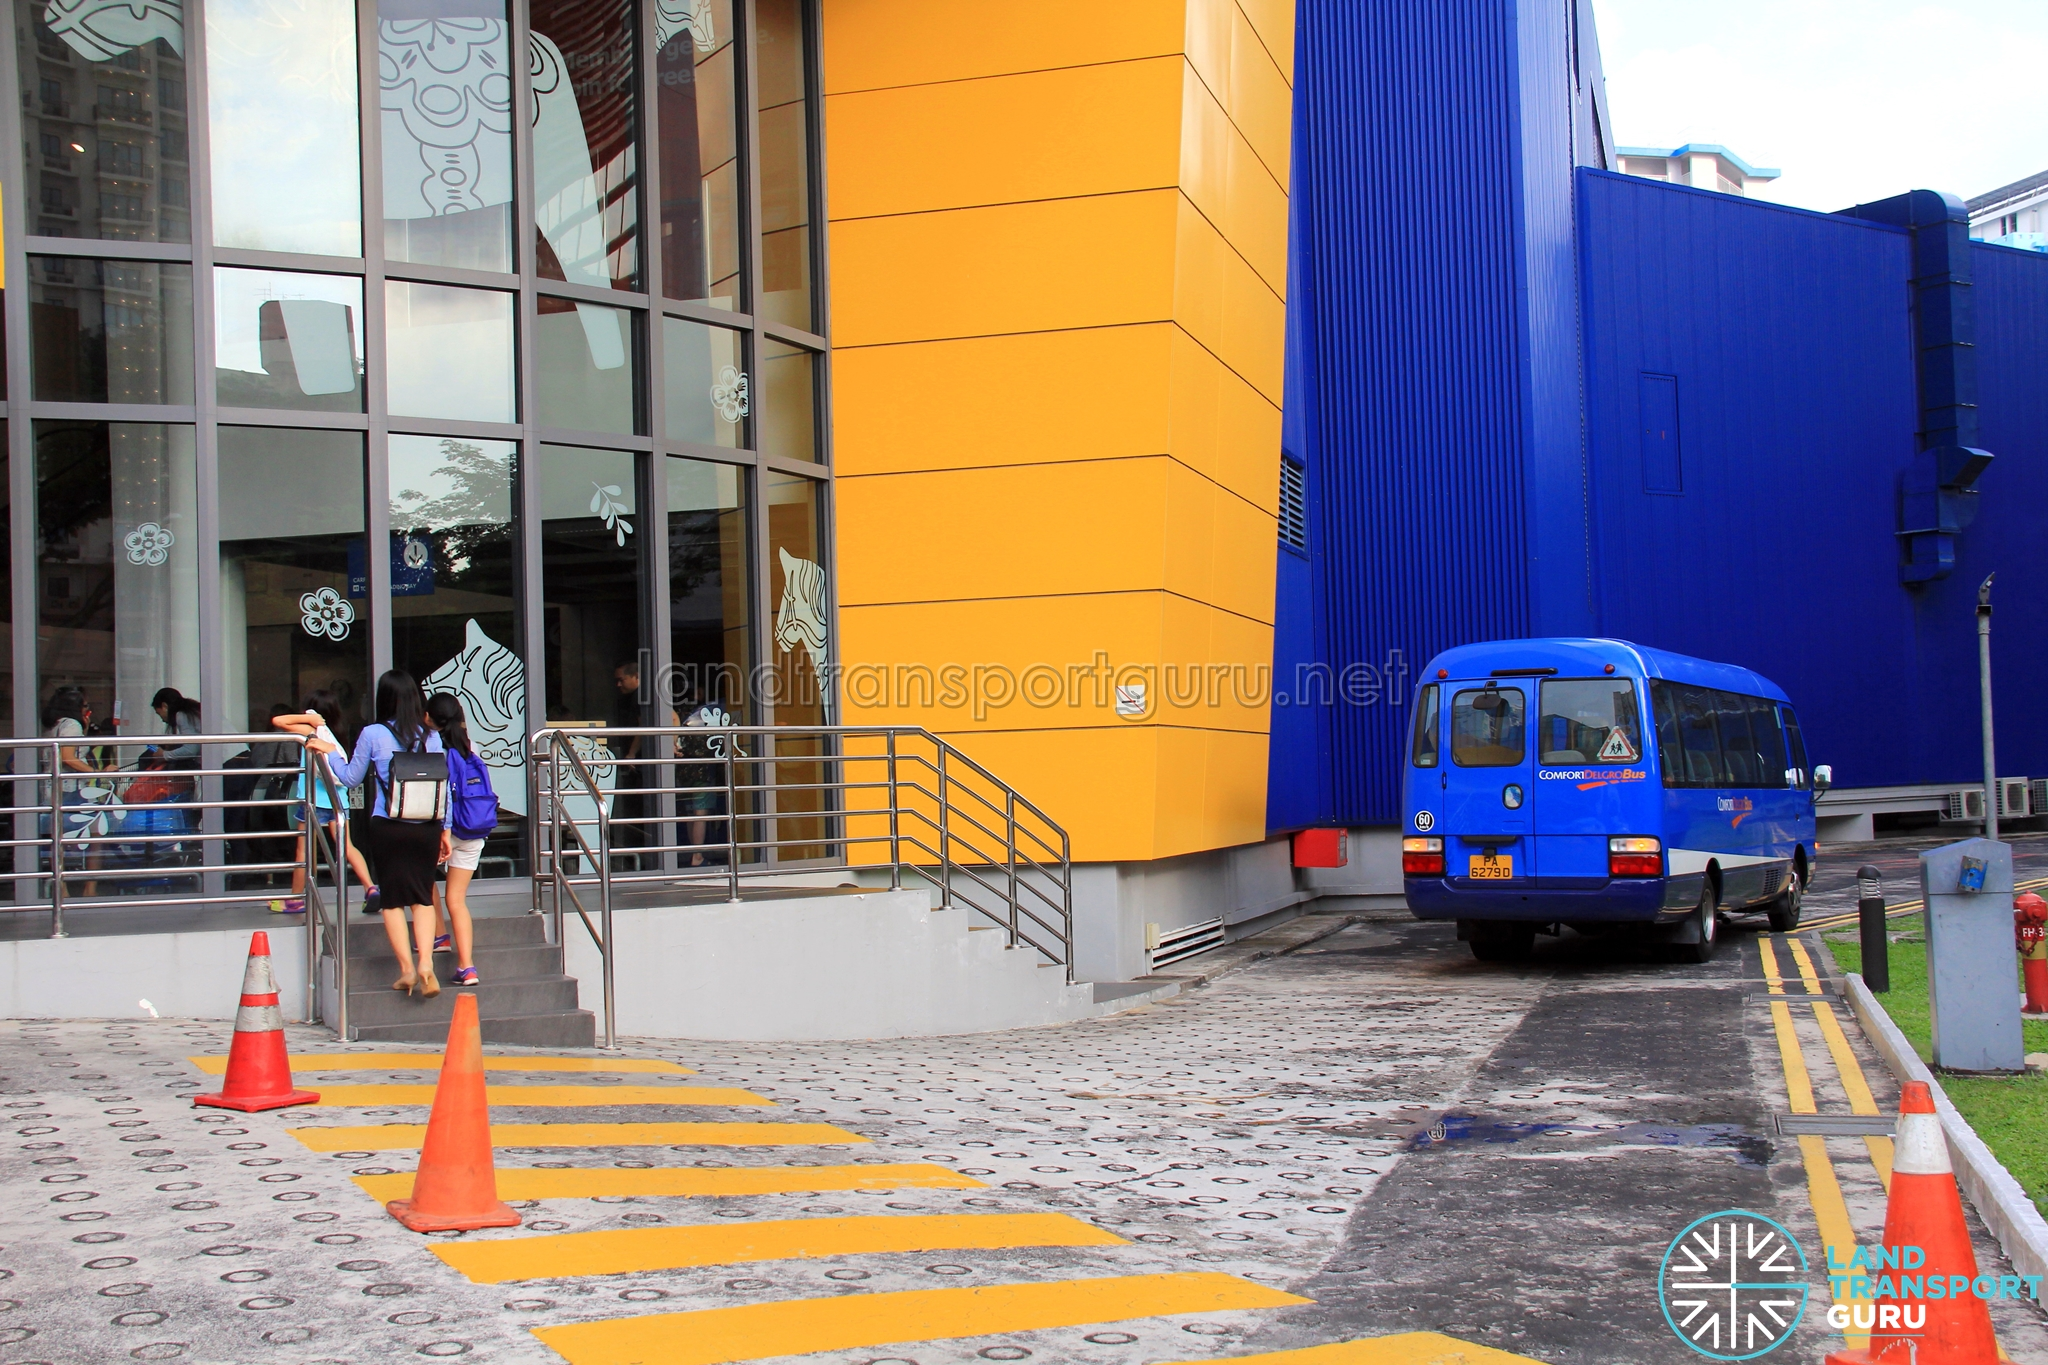 IKEA Alexandra Free Shuttle Bus Services | Land Transport Guru